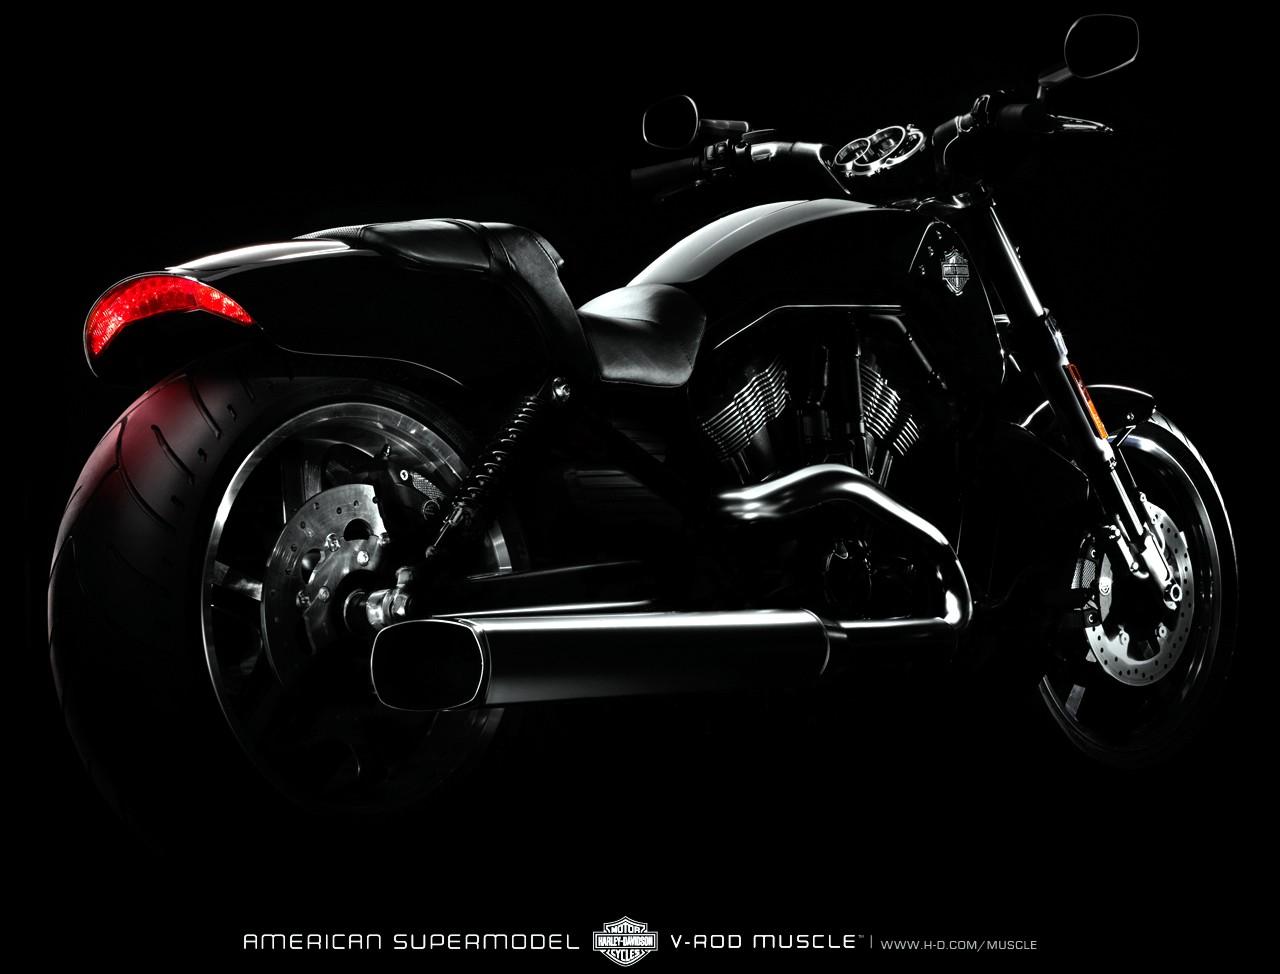 Harley Davidson V Rod Muscle 1280x974